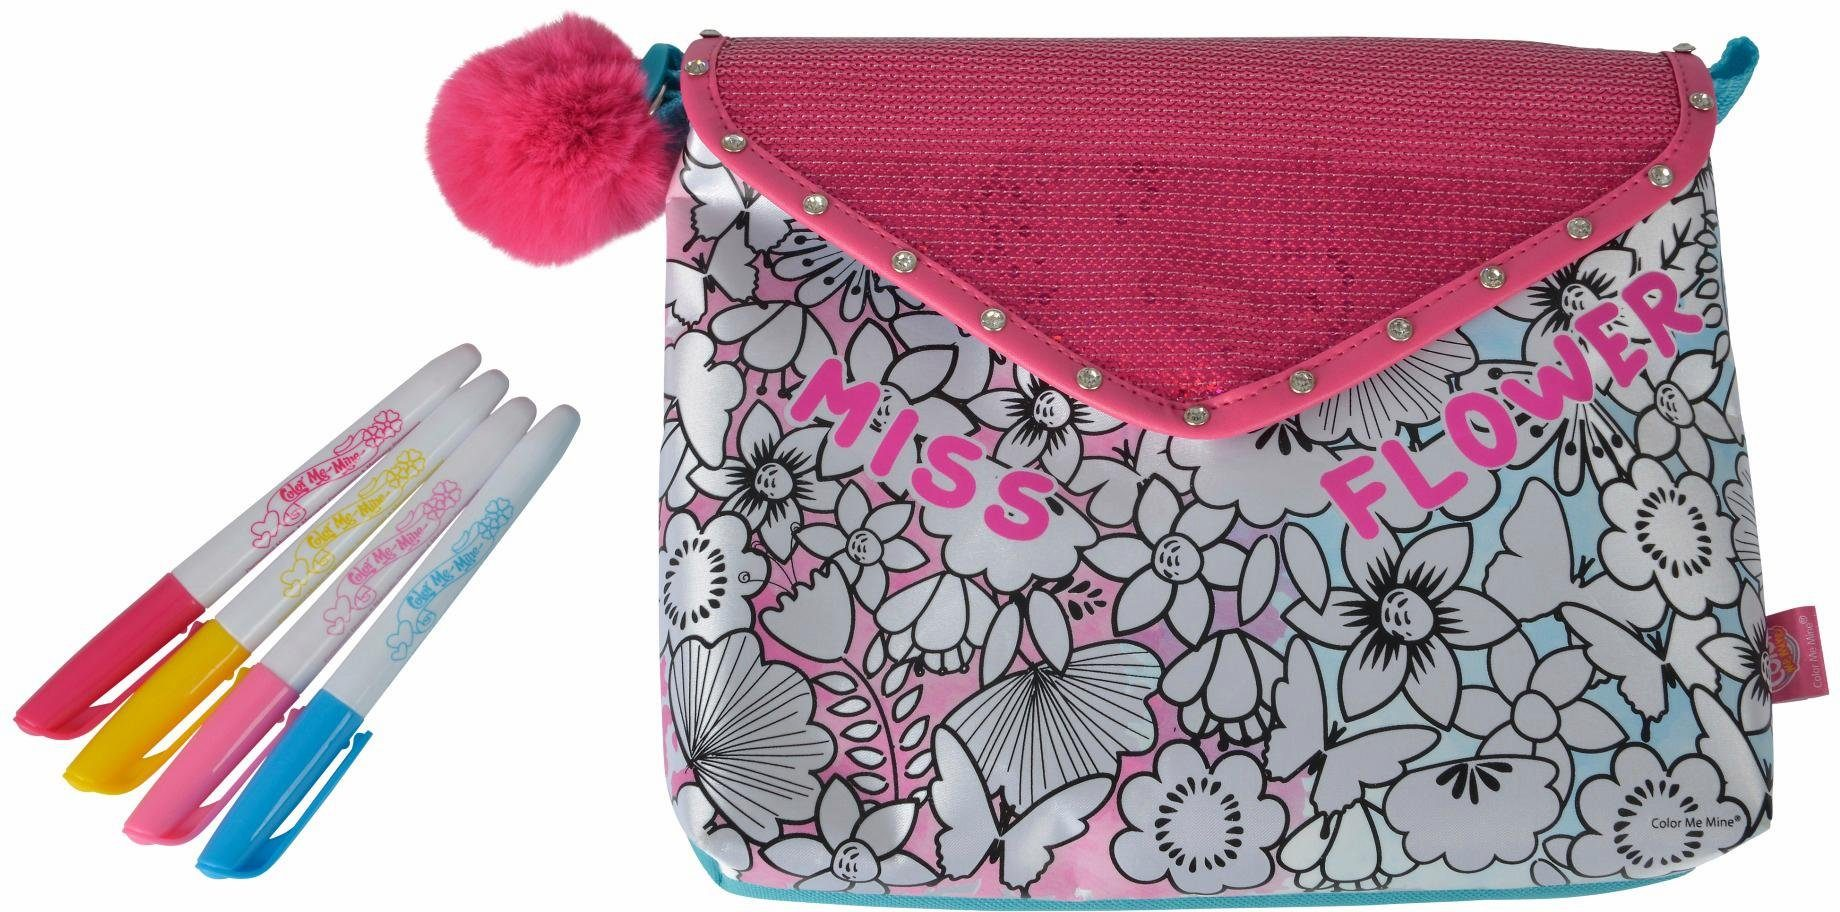 Simba Tasche zum Bemalen, »Color Me Mine, Couture Postal Bag«